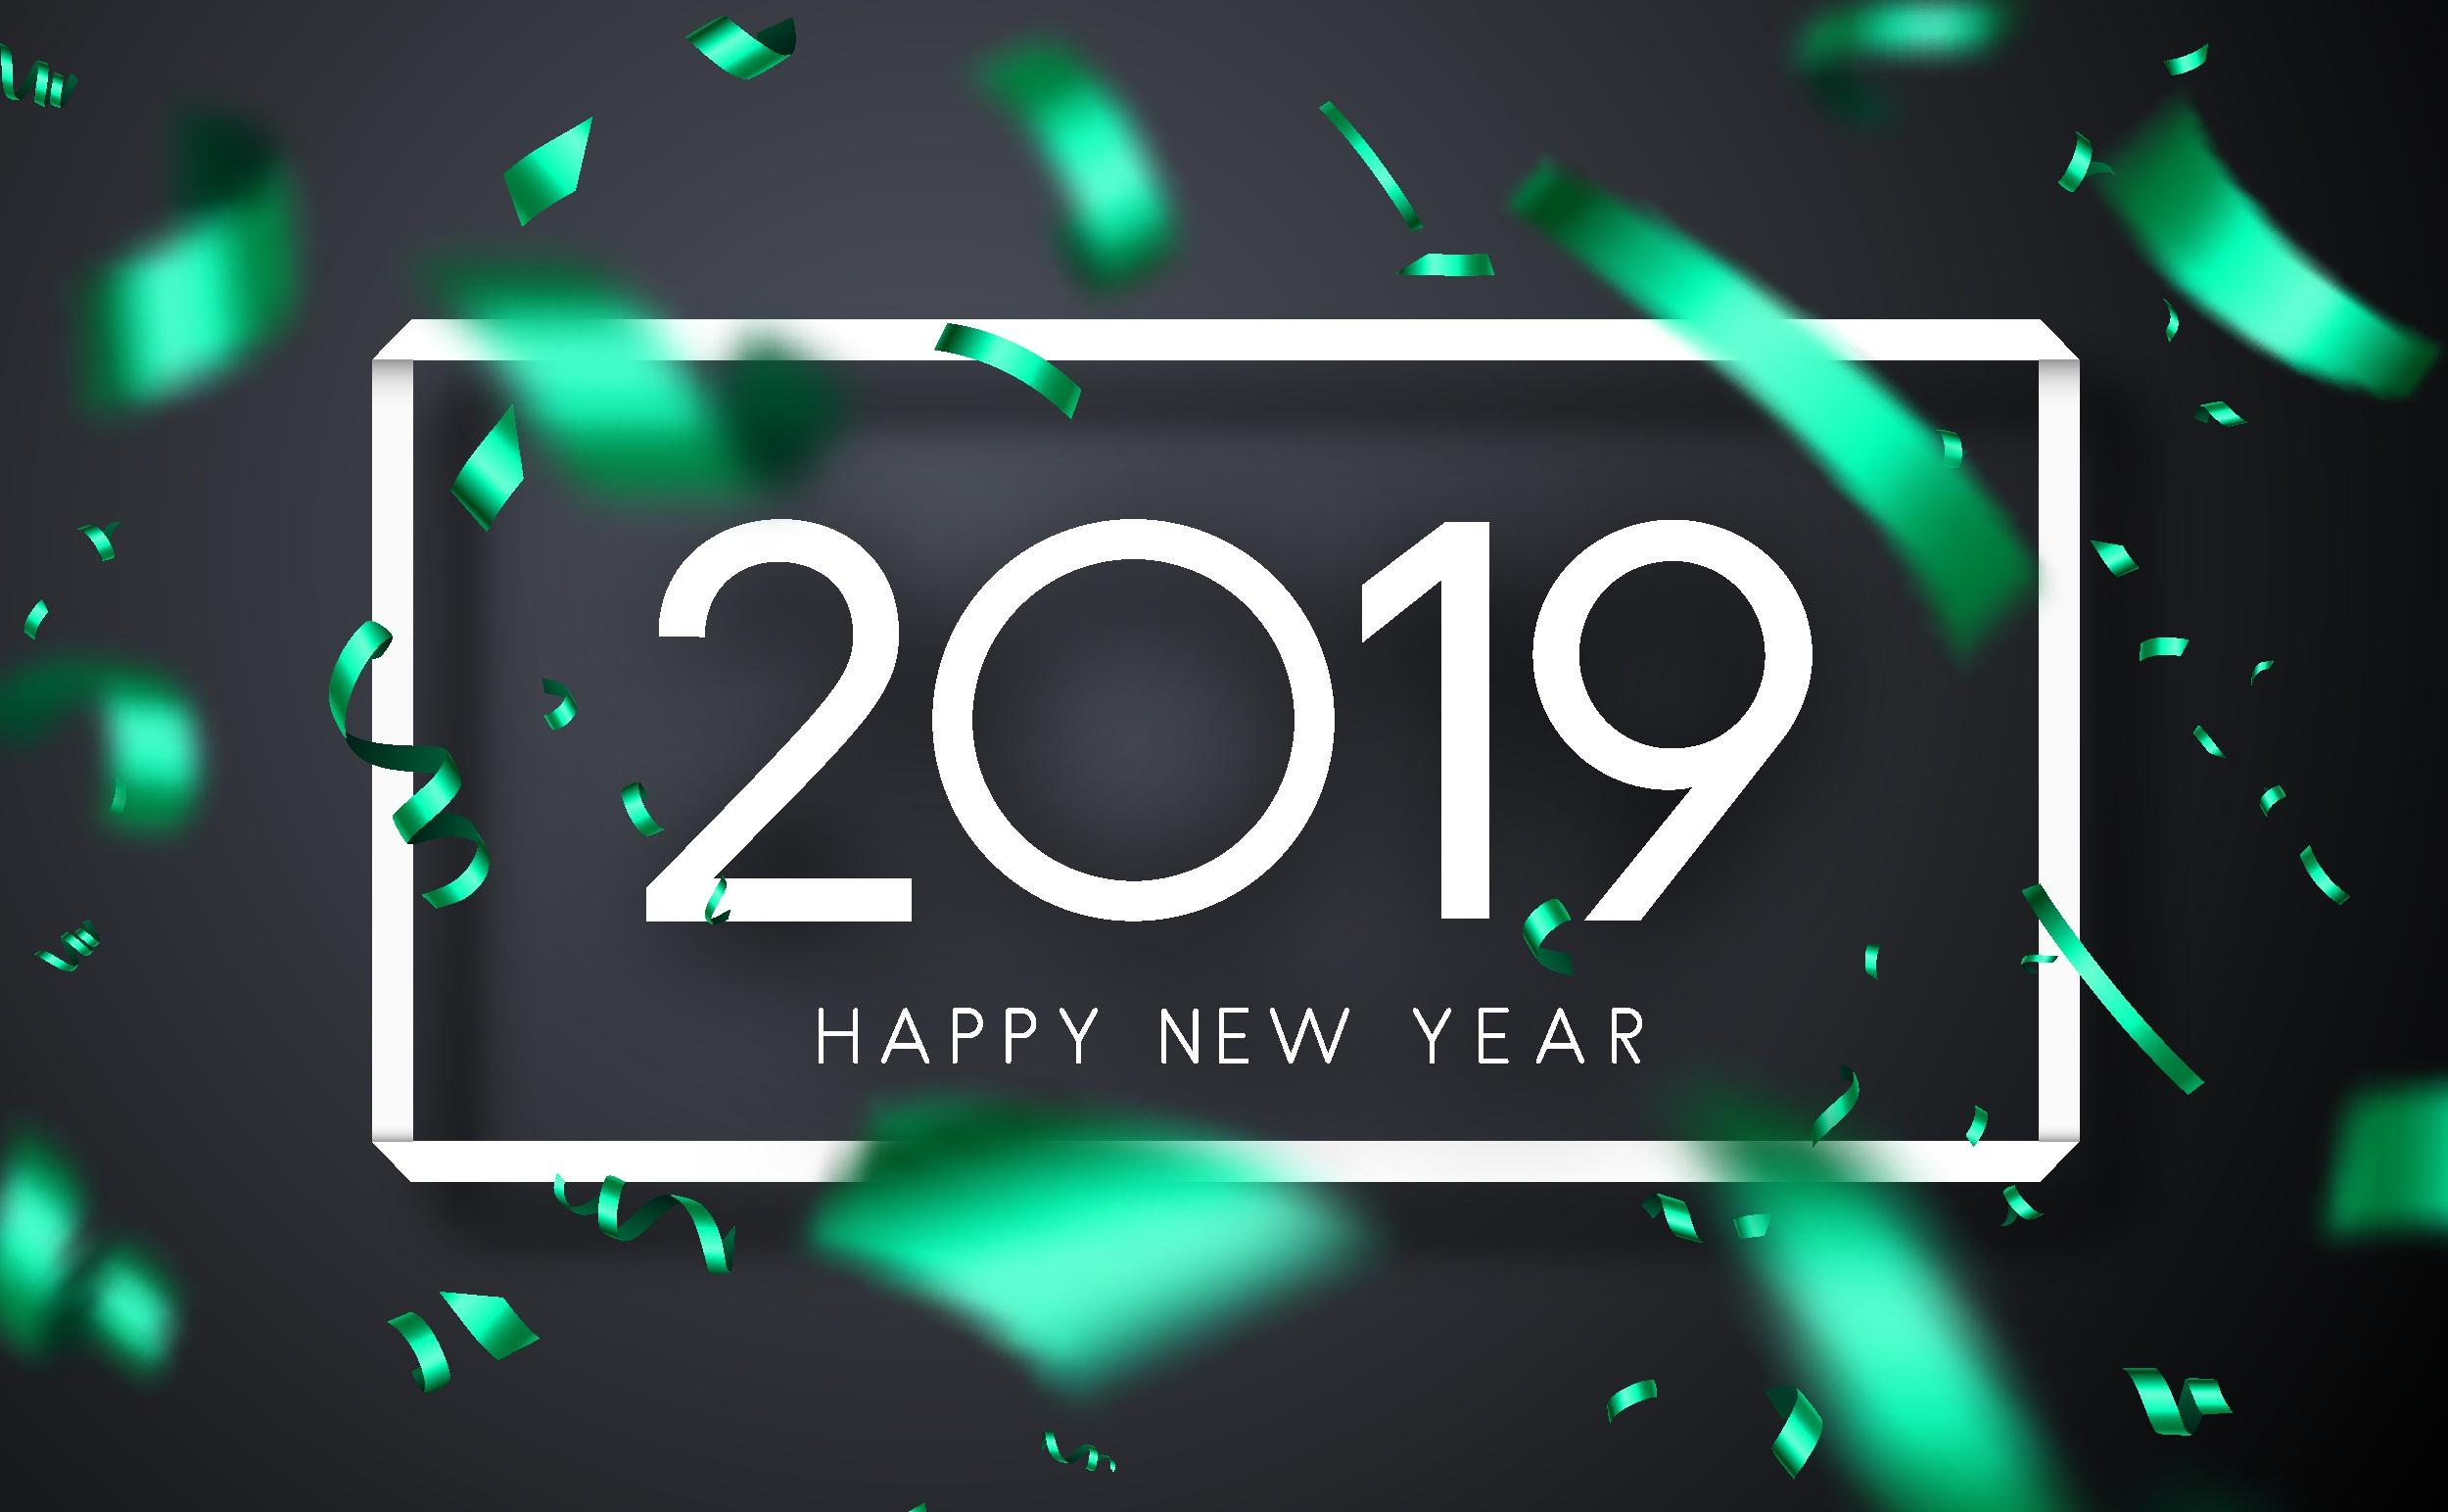 Wallpaper : Tahun Baru, 2019 Year, nomor, Selamat Tahun Baru